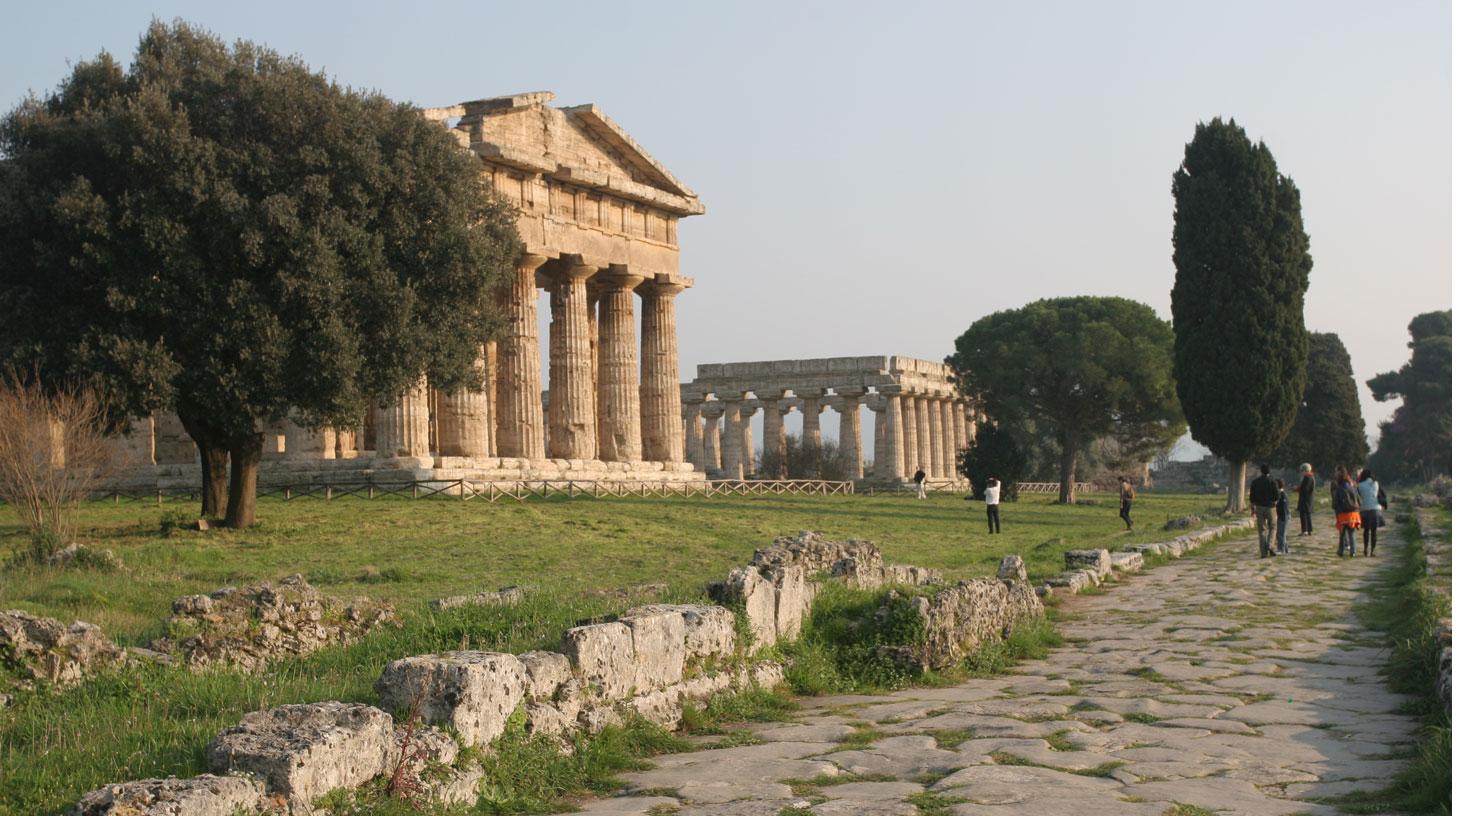 Le site antique de Paestum